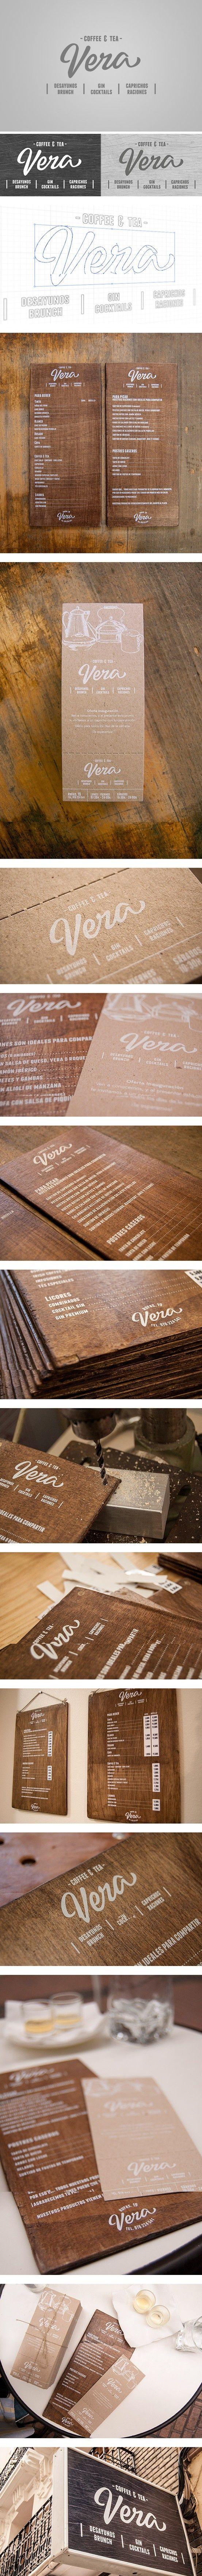 restaurants inspiration / branding | Vera brand & menu design | restaurant menu